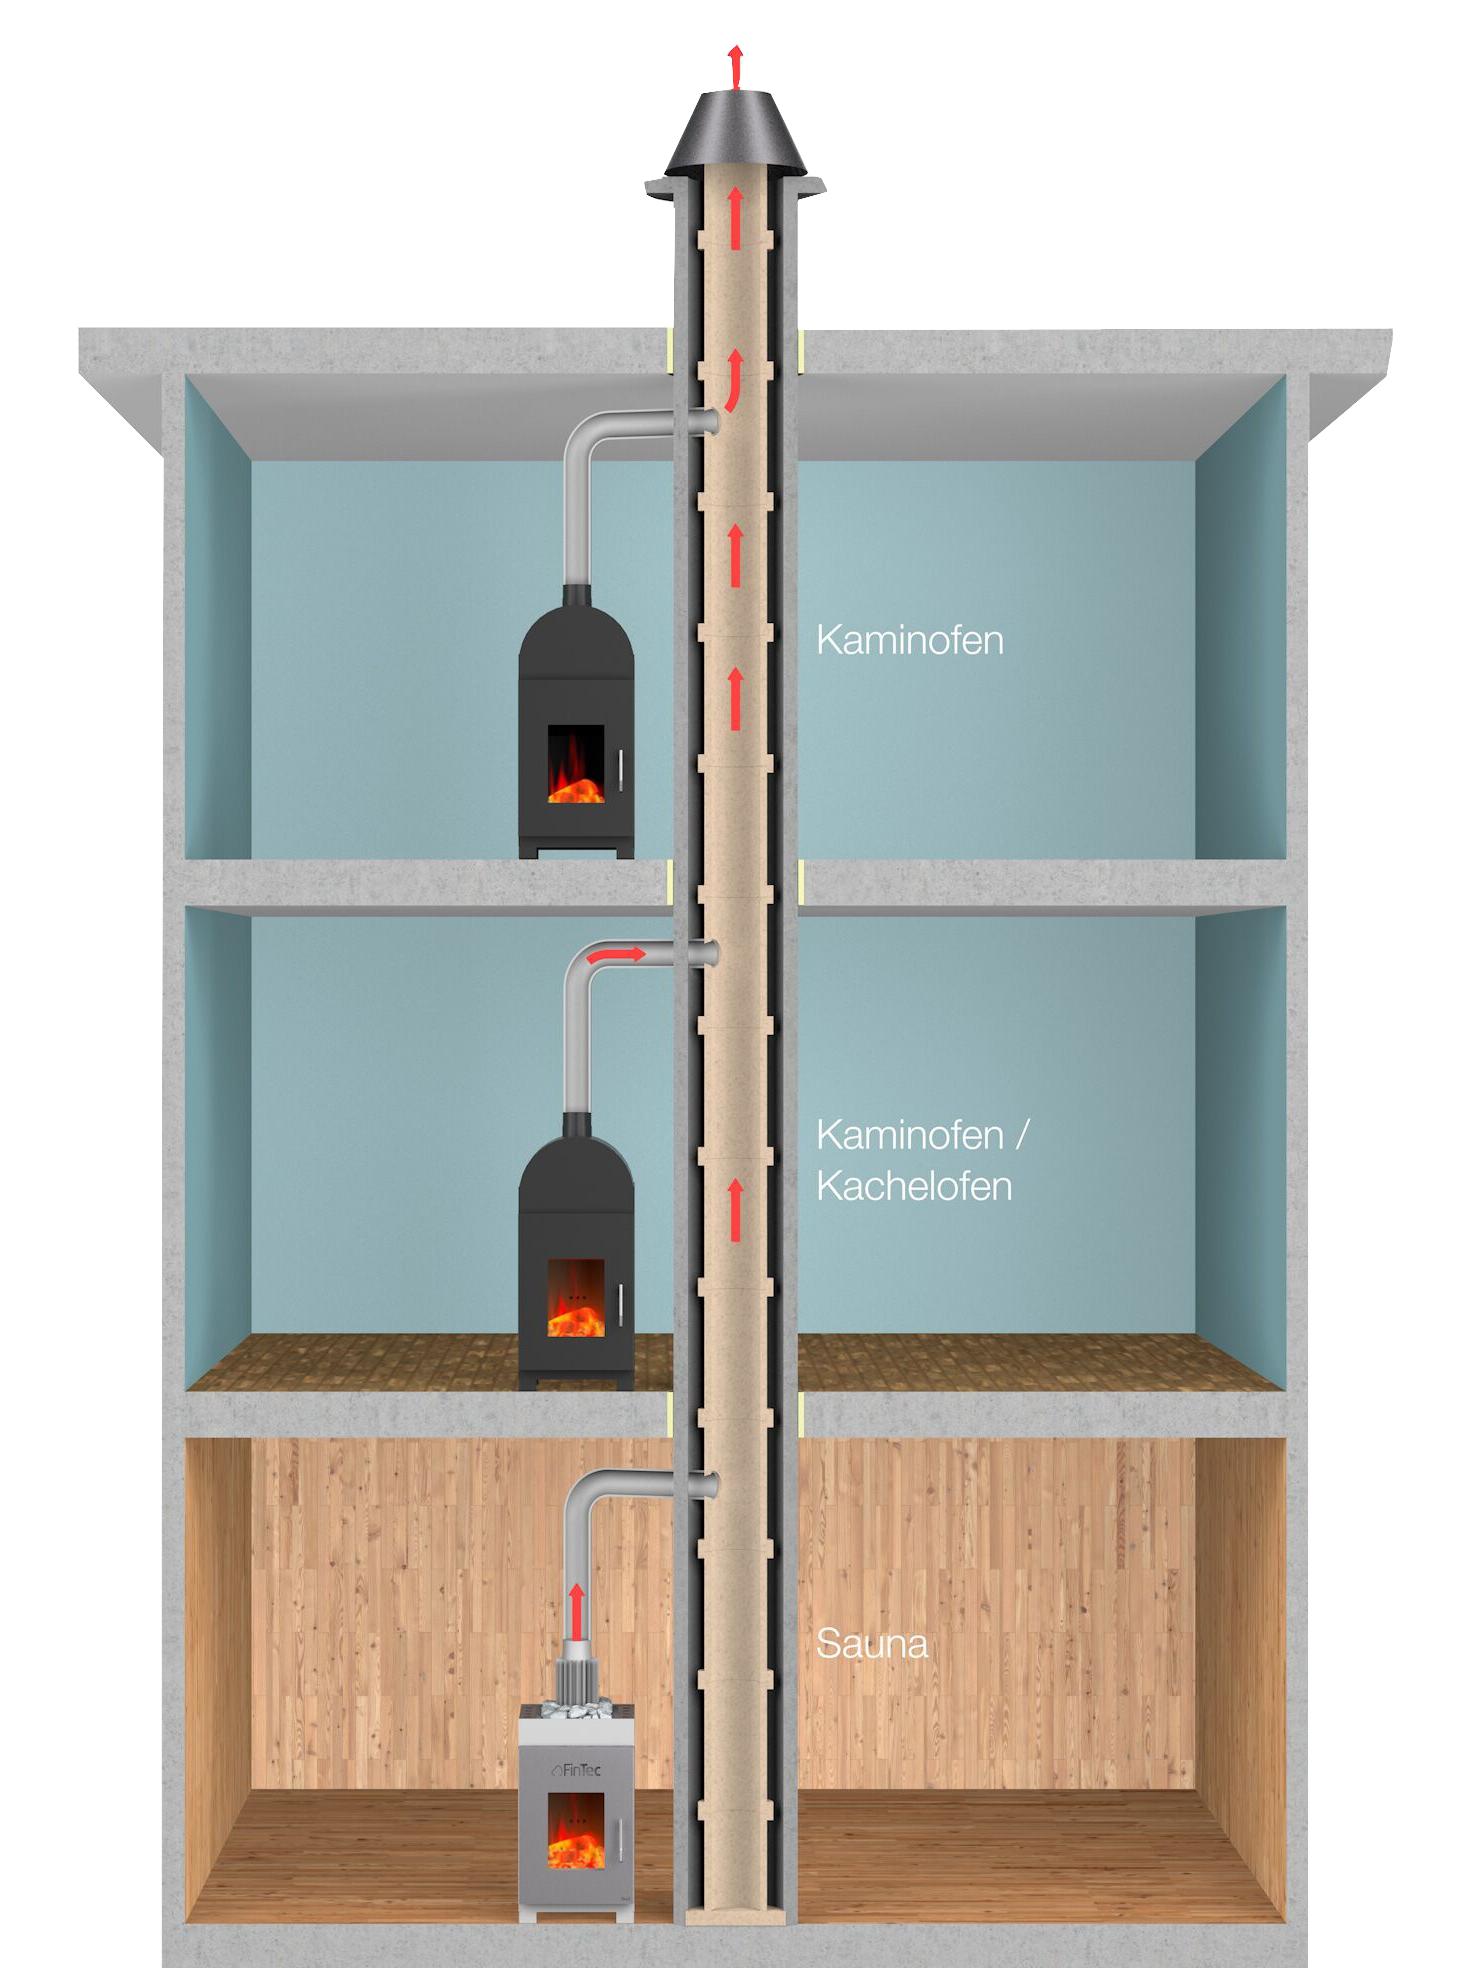 Mehrfachbelegung bei Saunaöfen